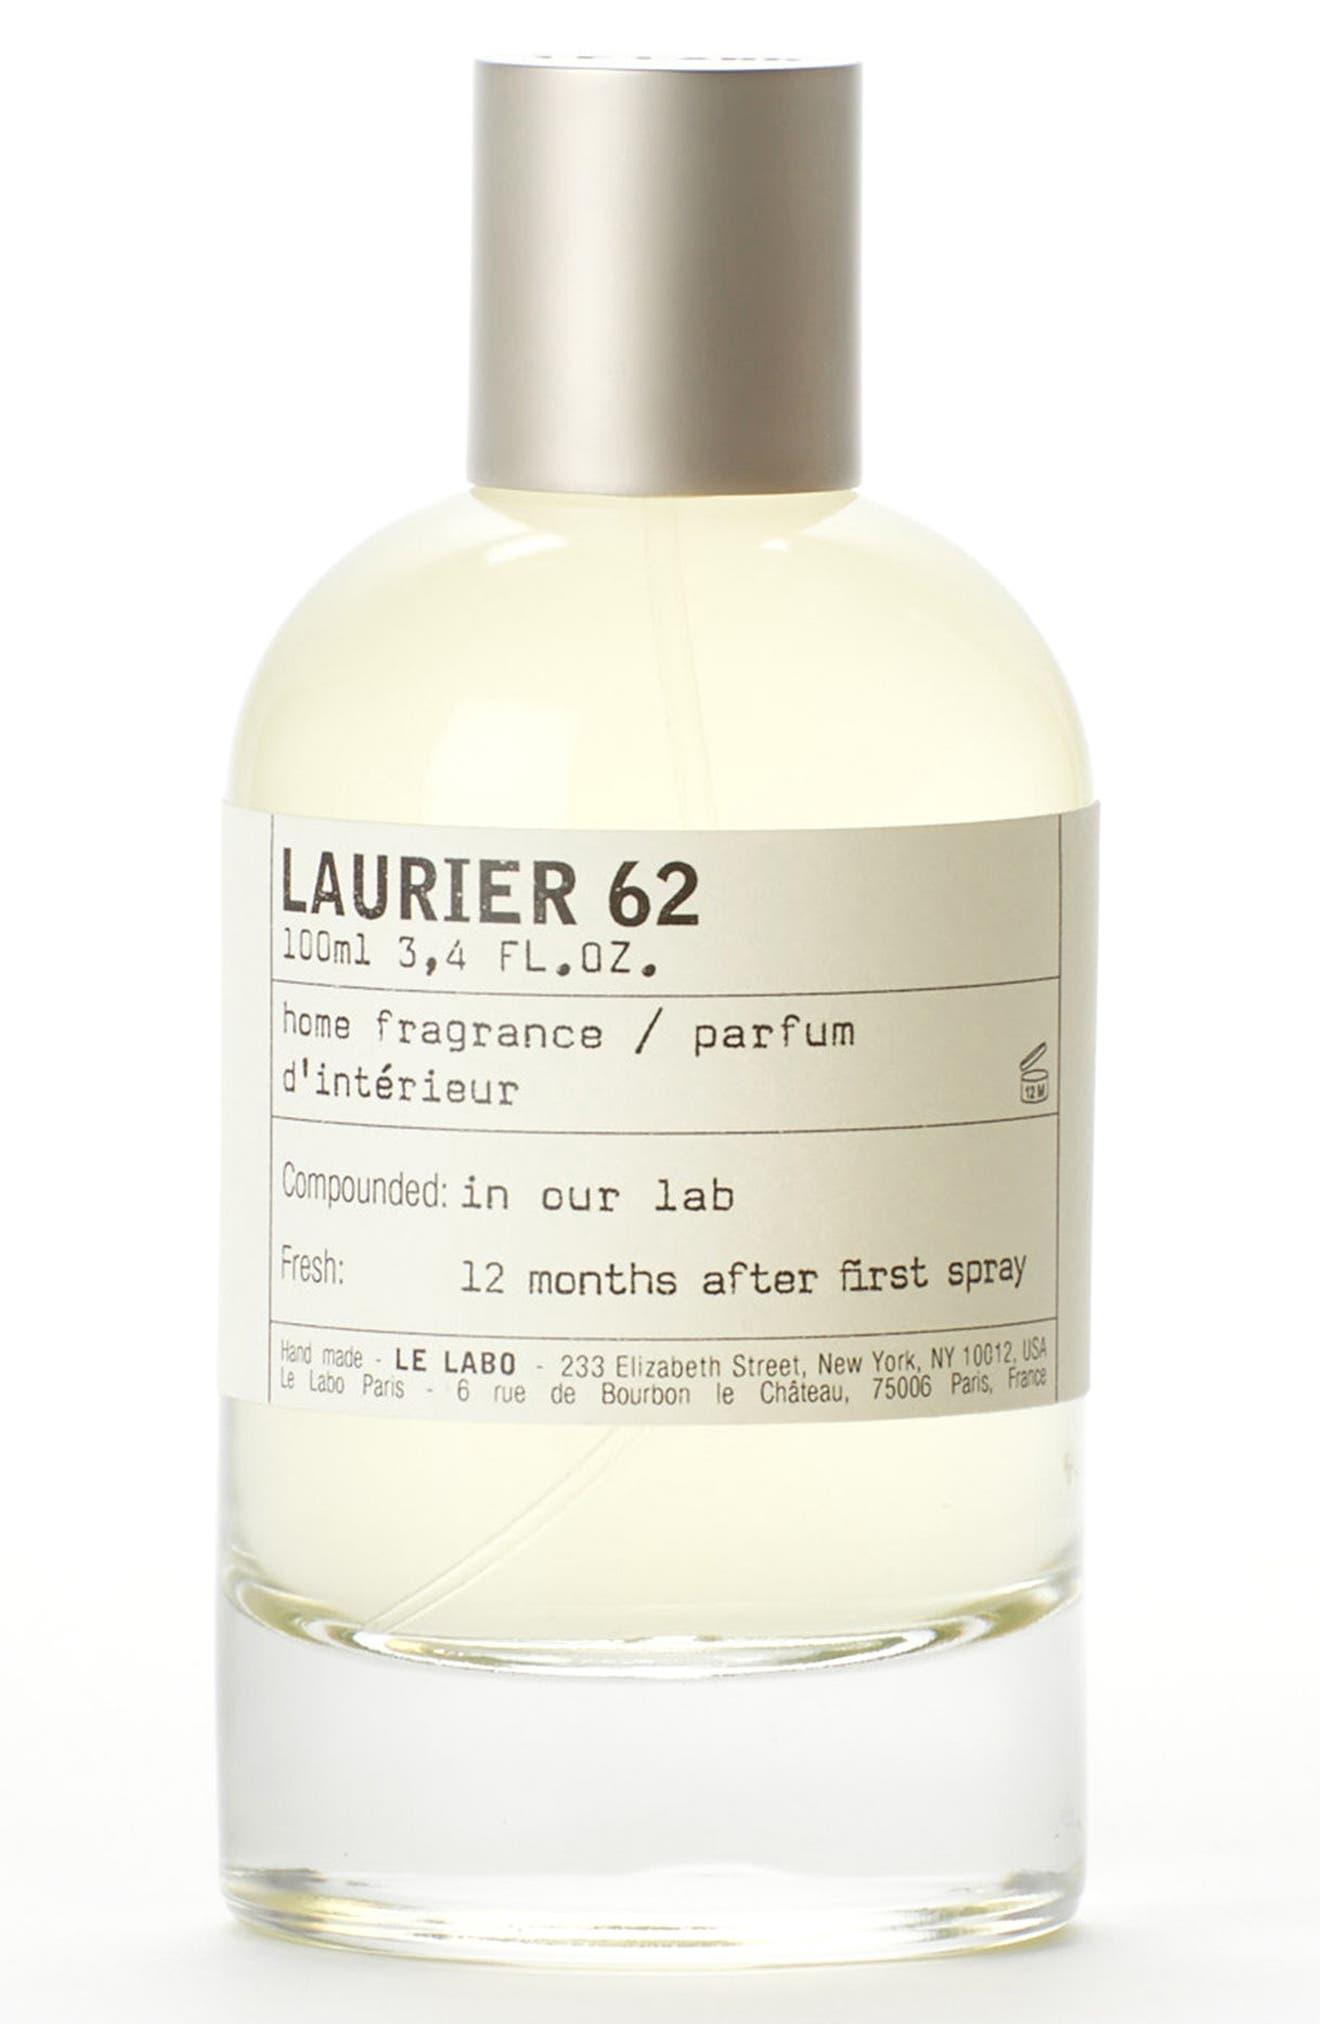 Le Labo 'Laurier 61' Home Fragrance Spray